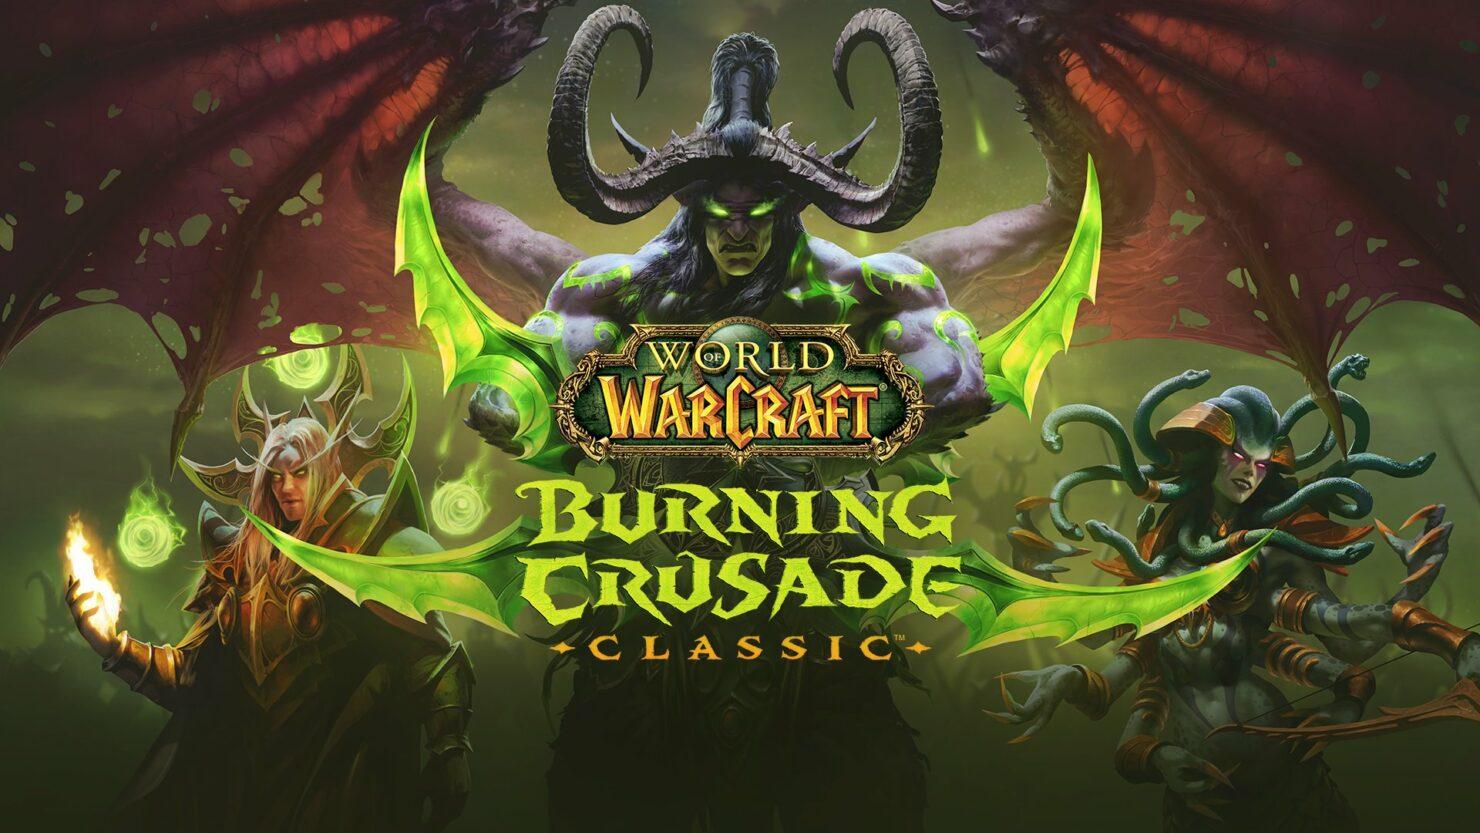 burning crusade classic pre-patch